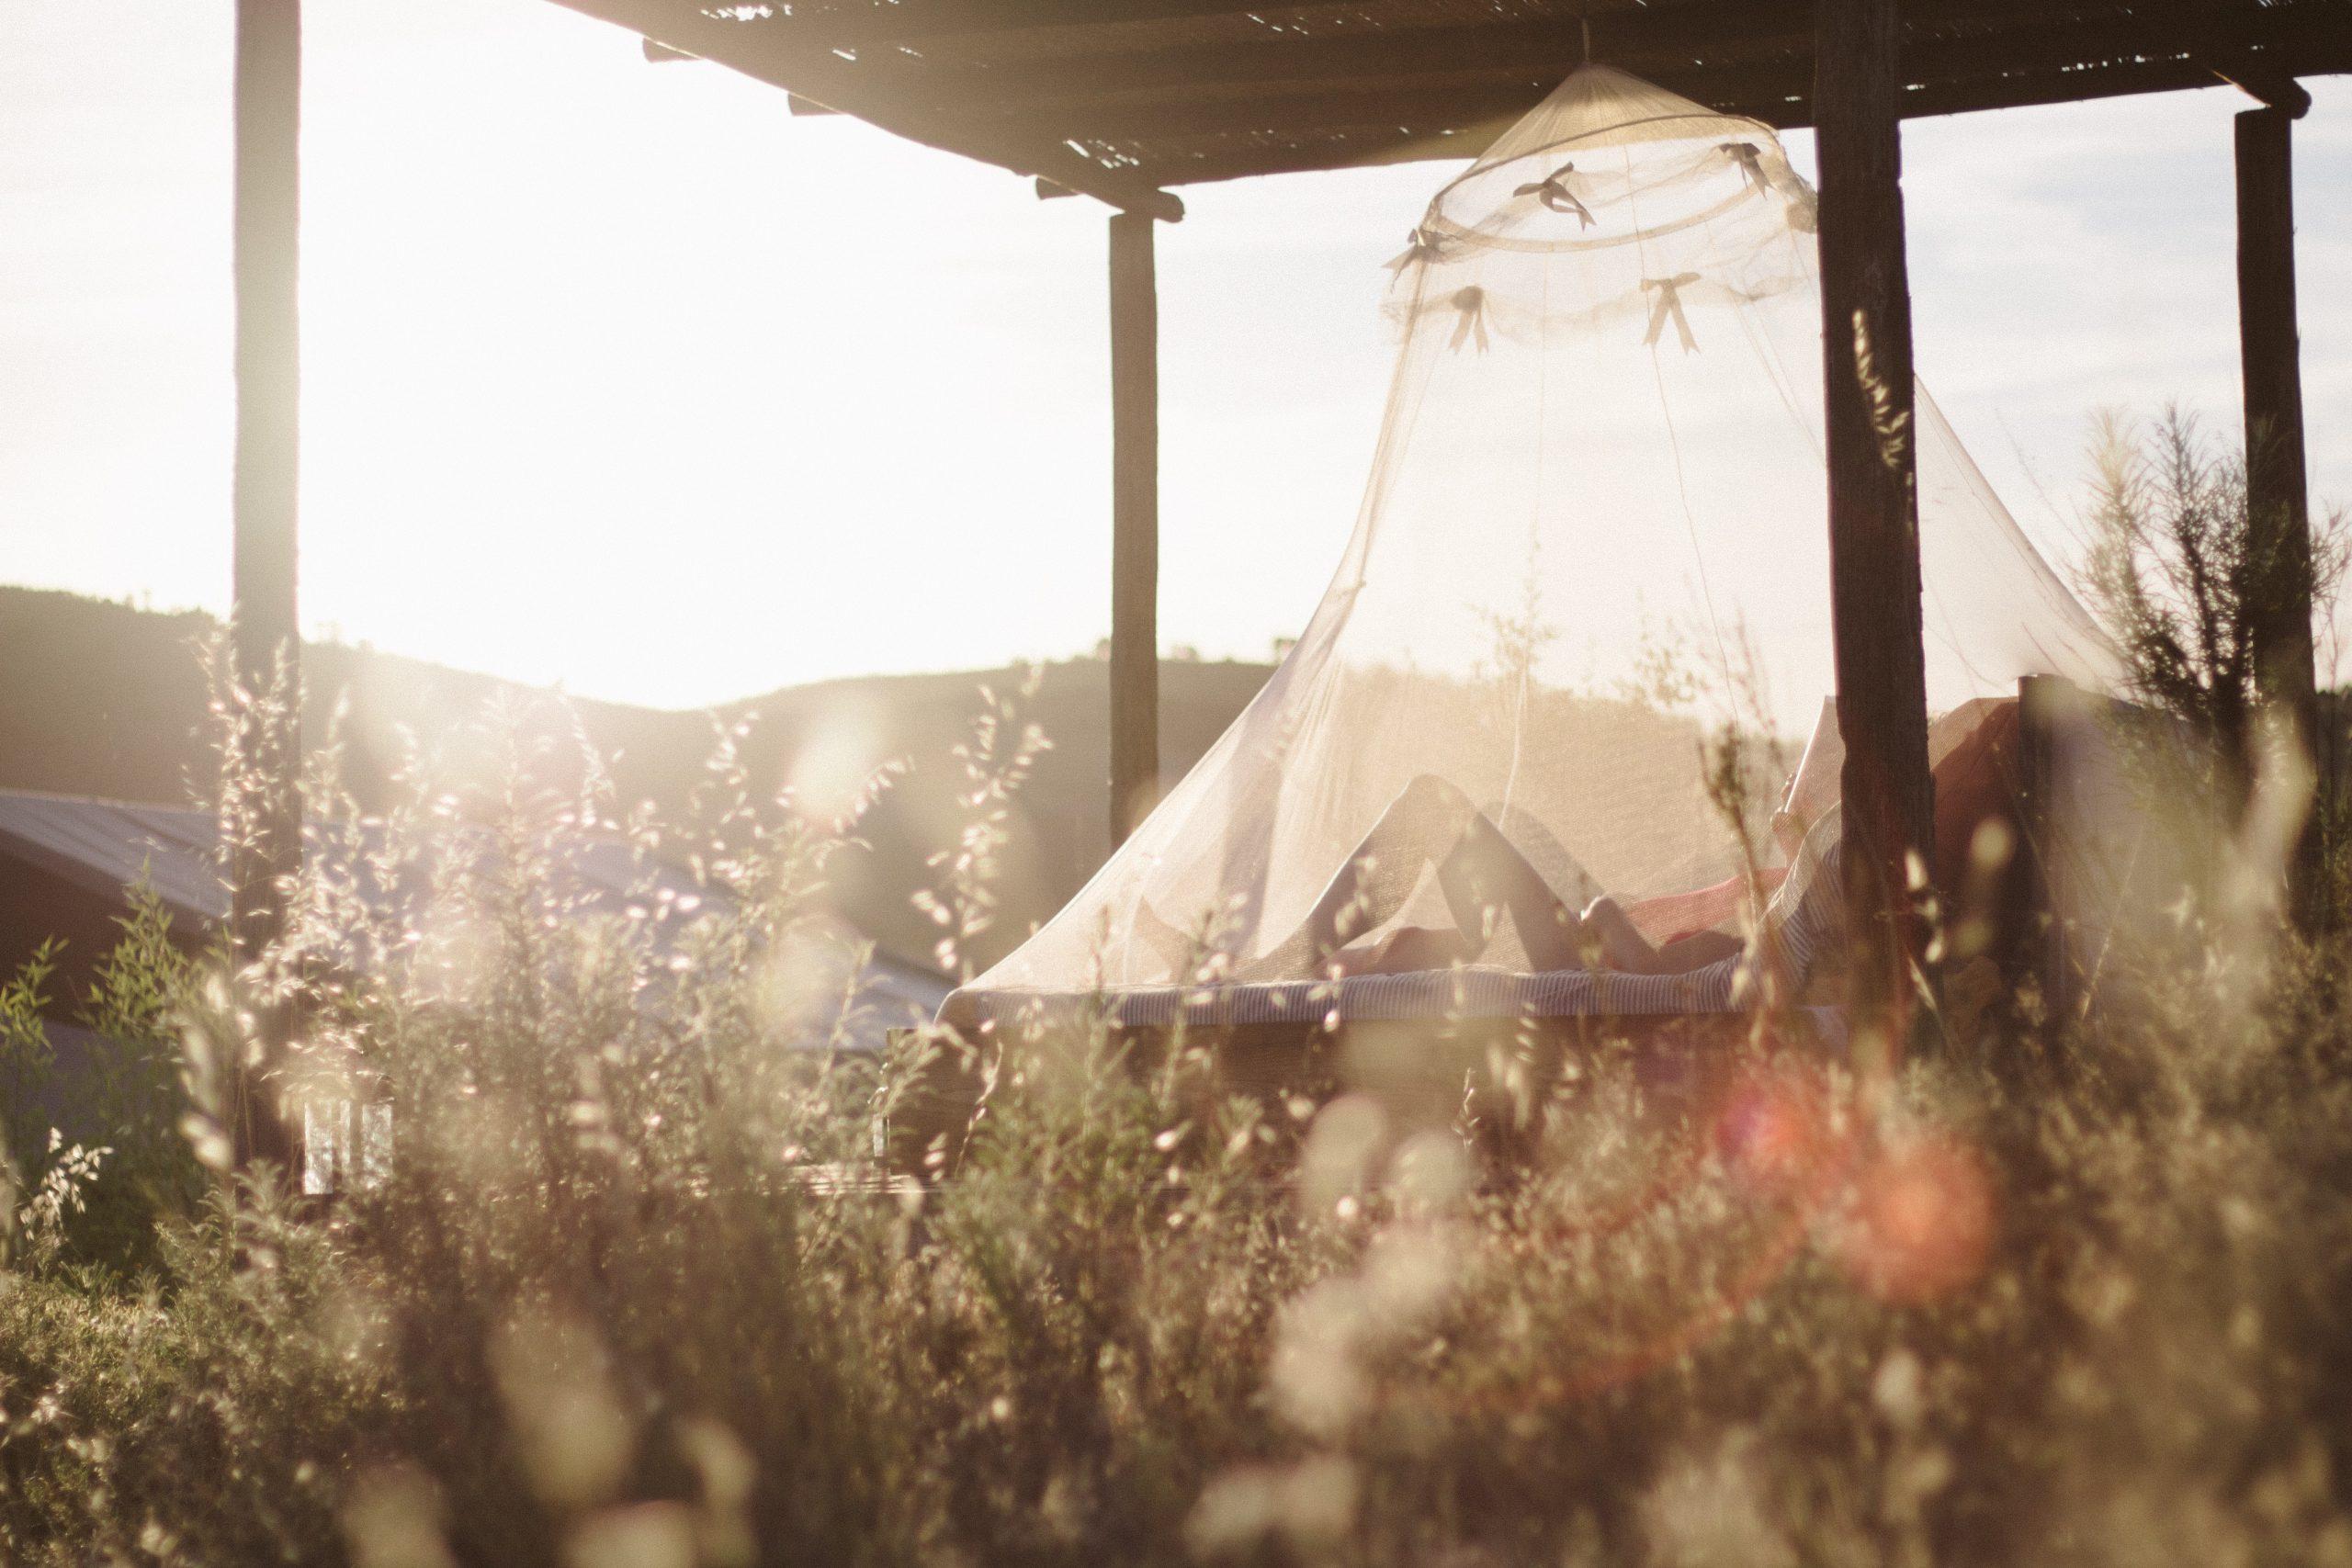 campo con cama